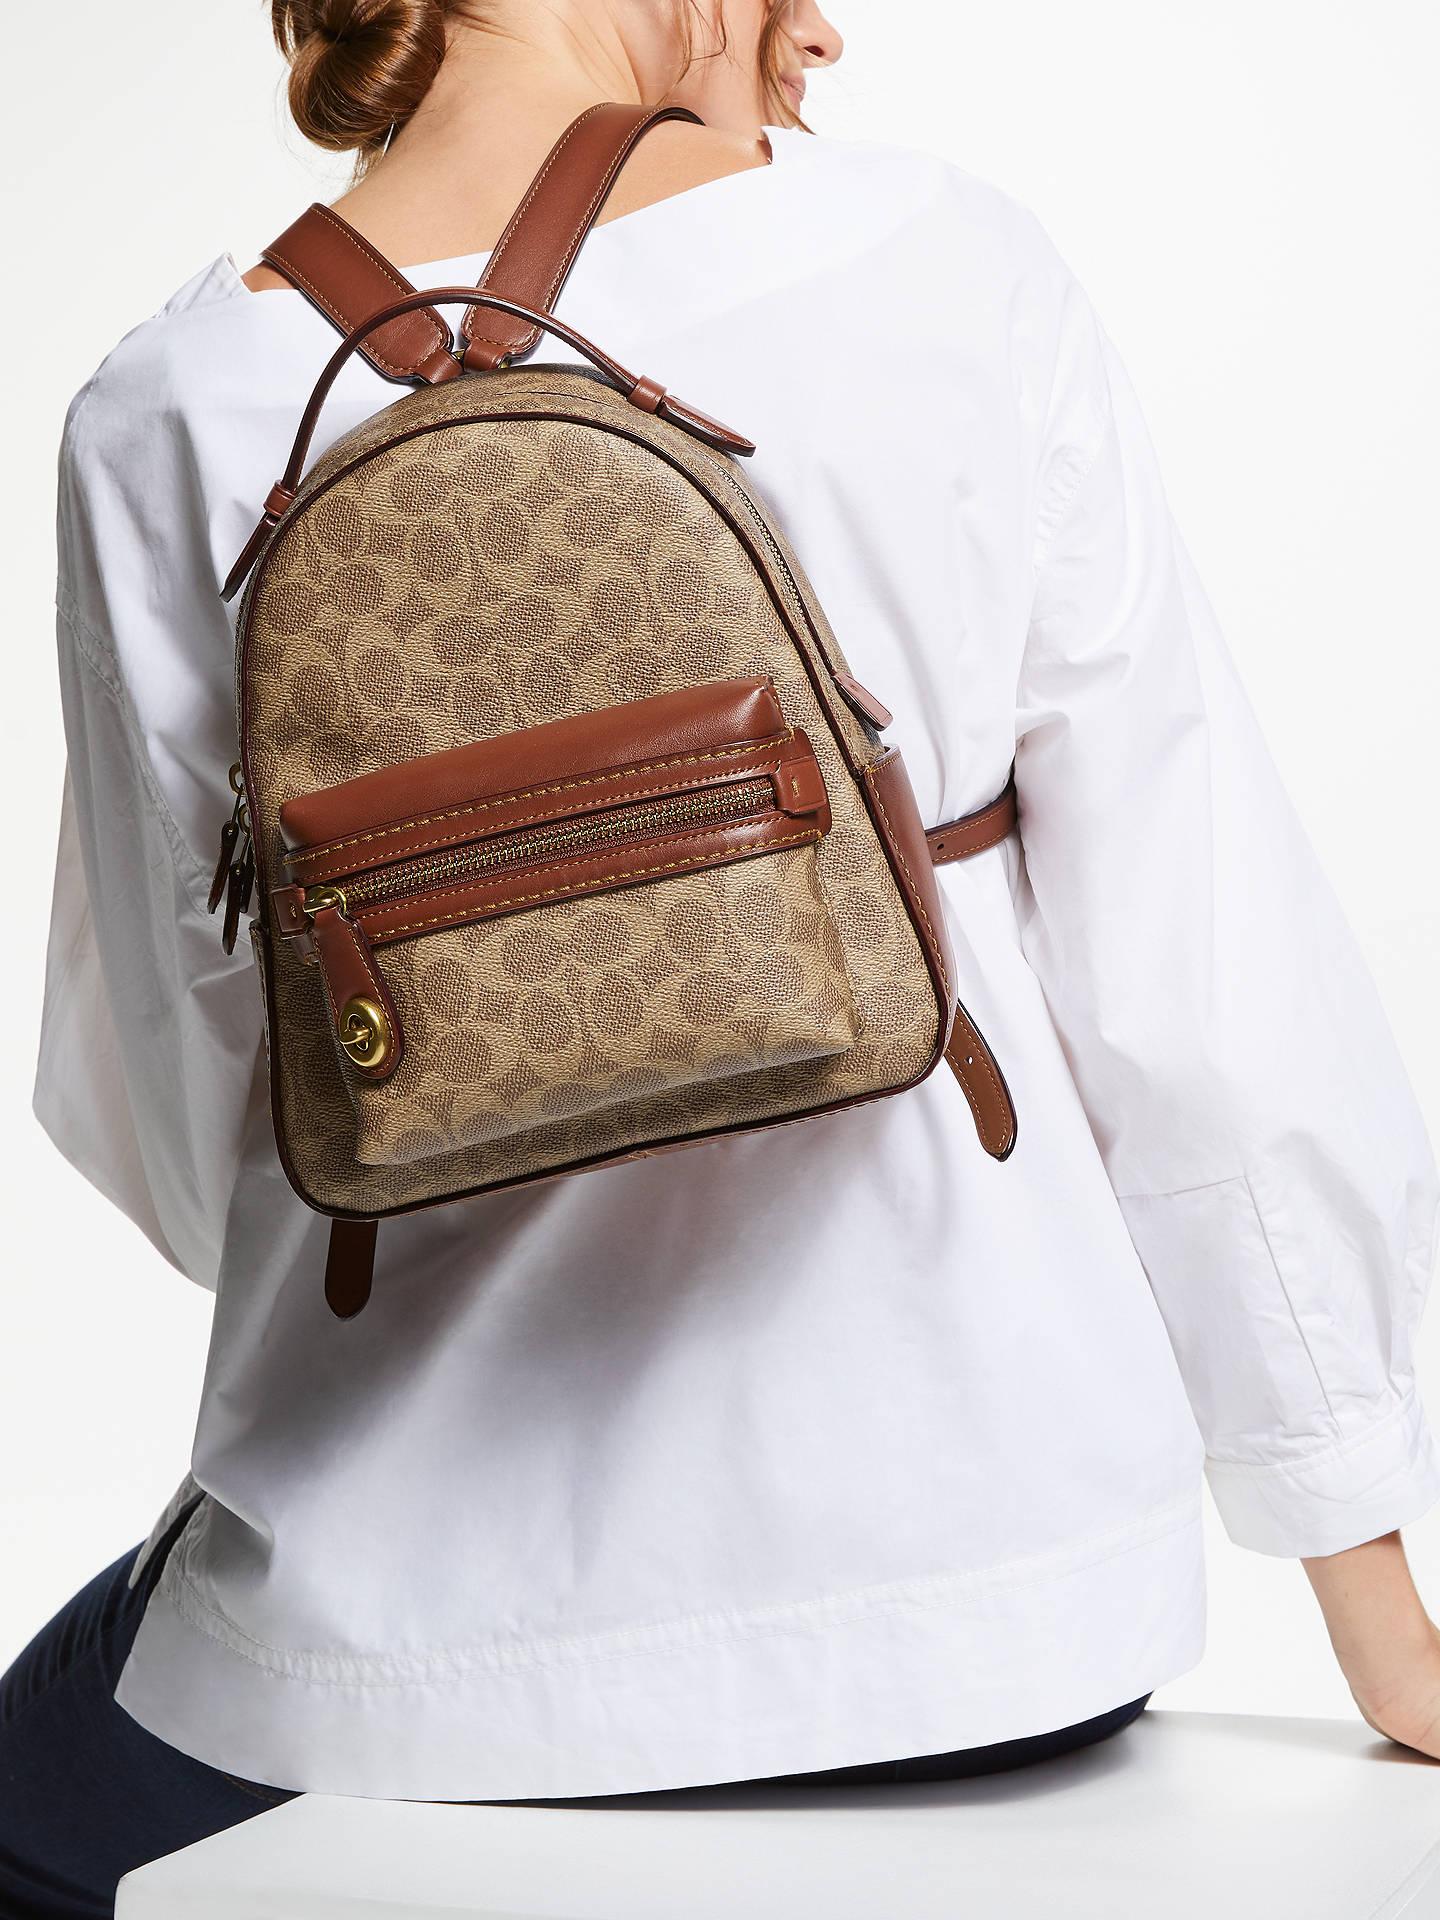 c444701255f03 ... Buy Coach Signature Campus Backpack